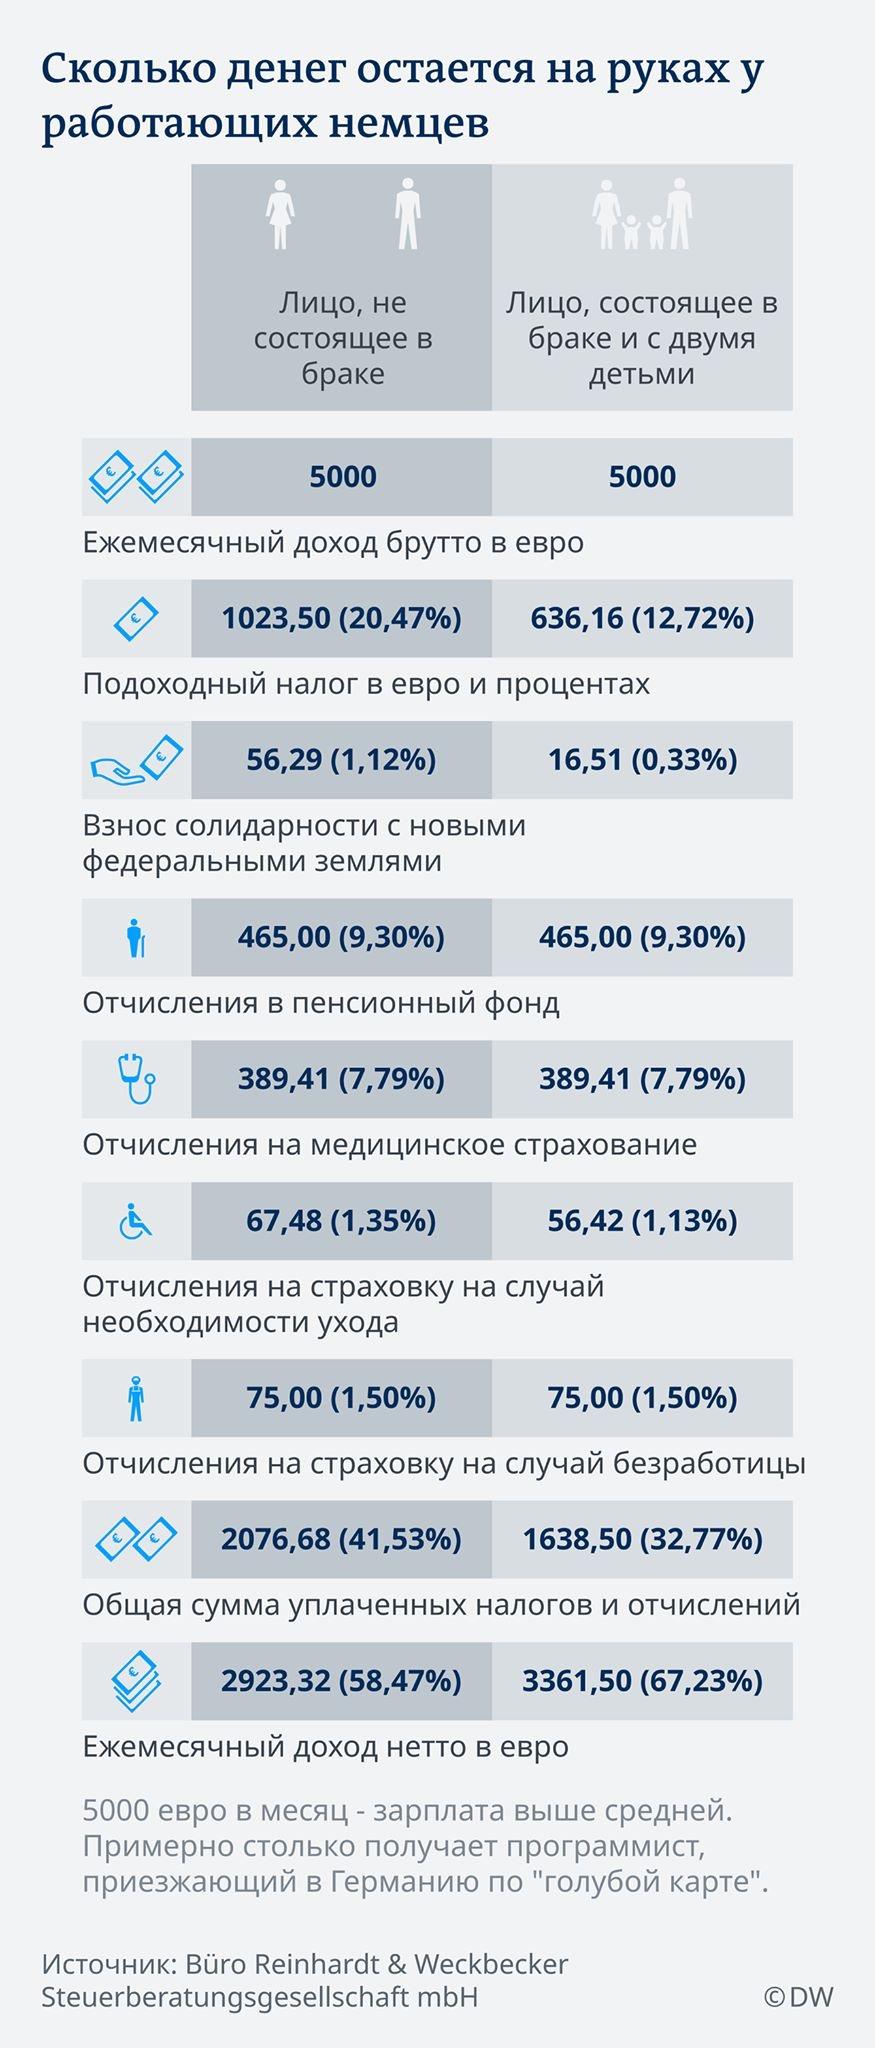 https://ic.pics.livejournal.com/matveychev_oleg/27303223/11455830/11455830_original.jpg